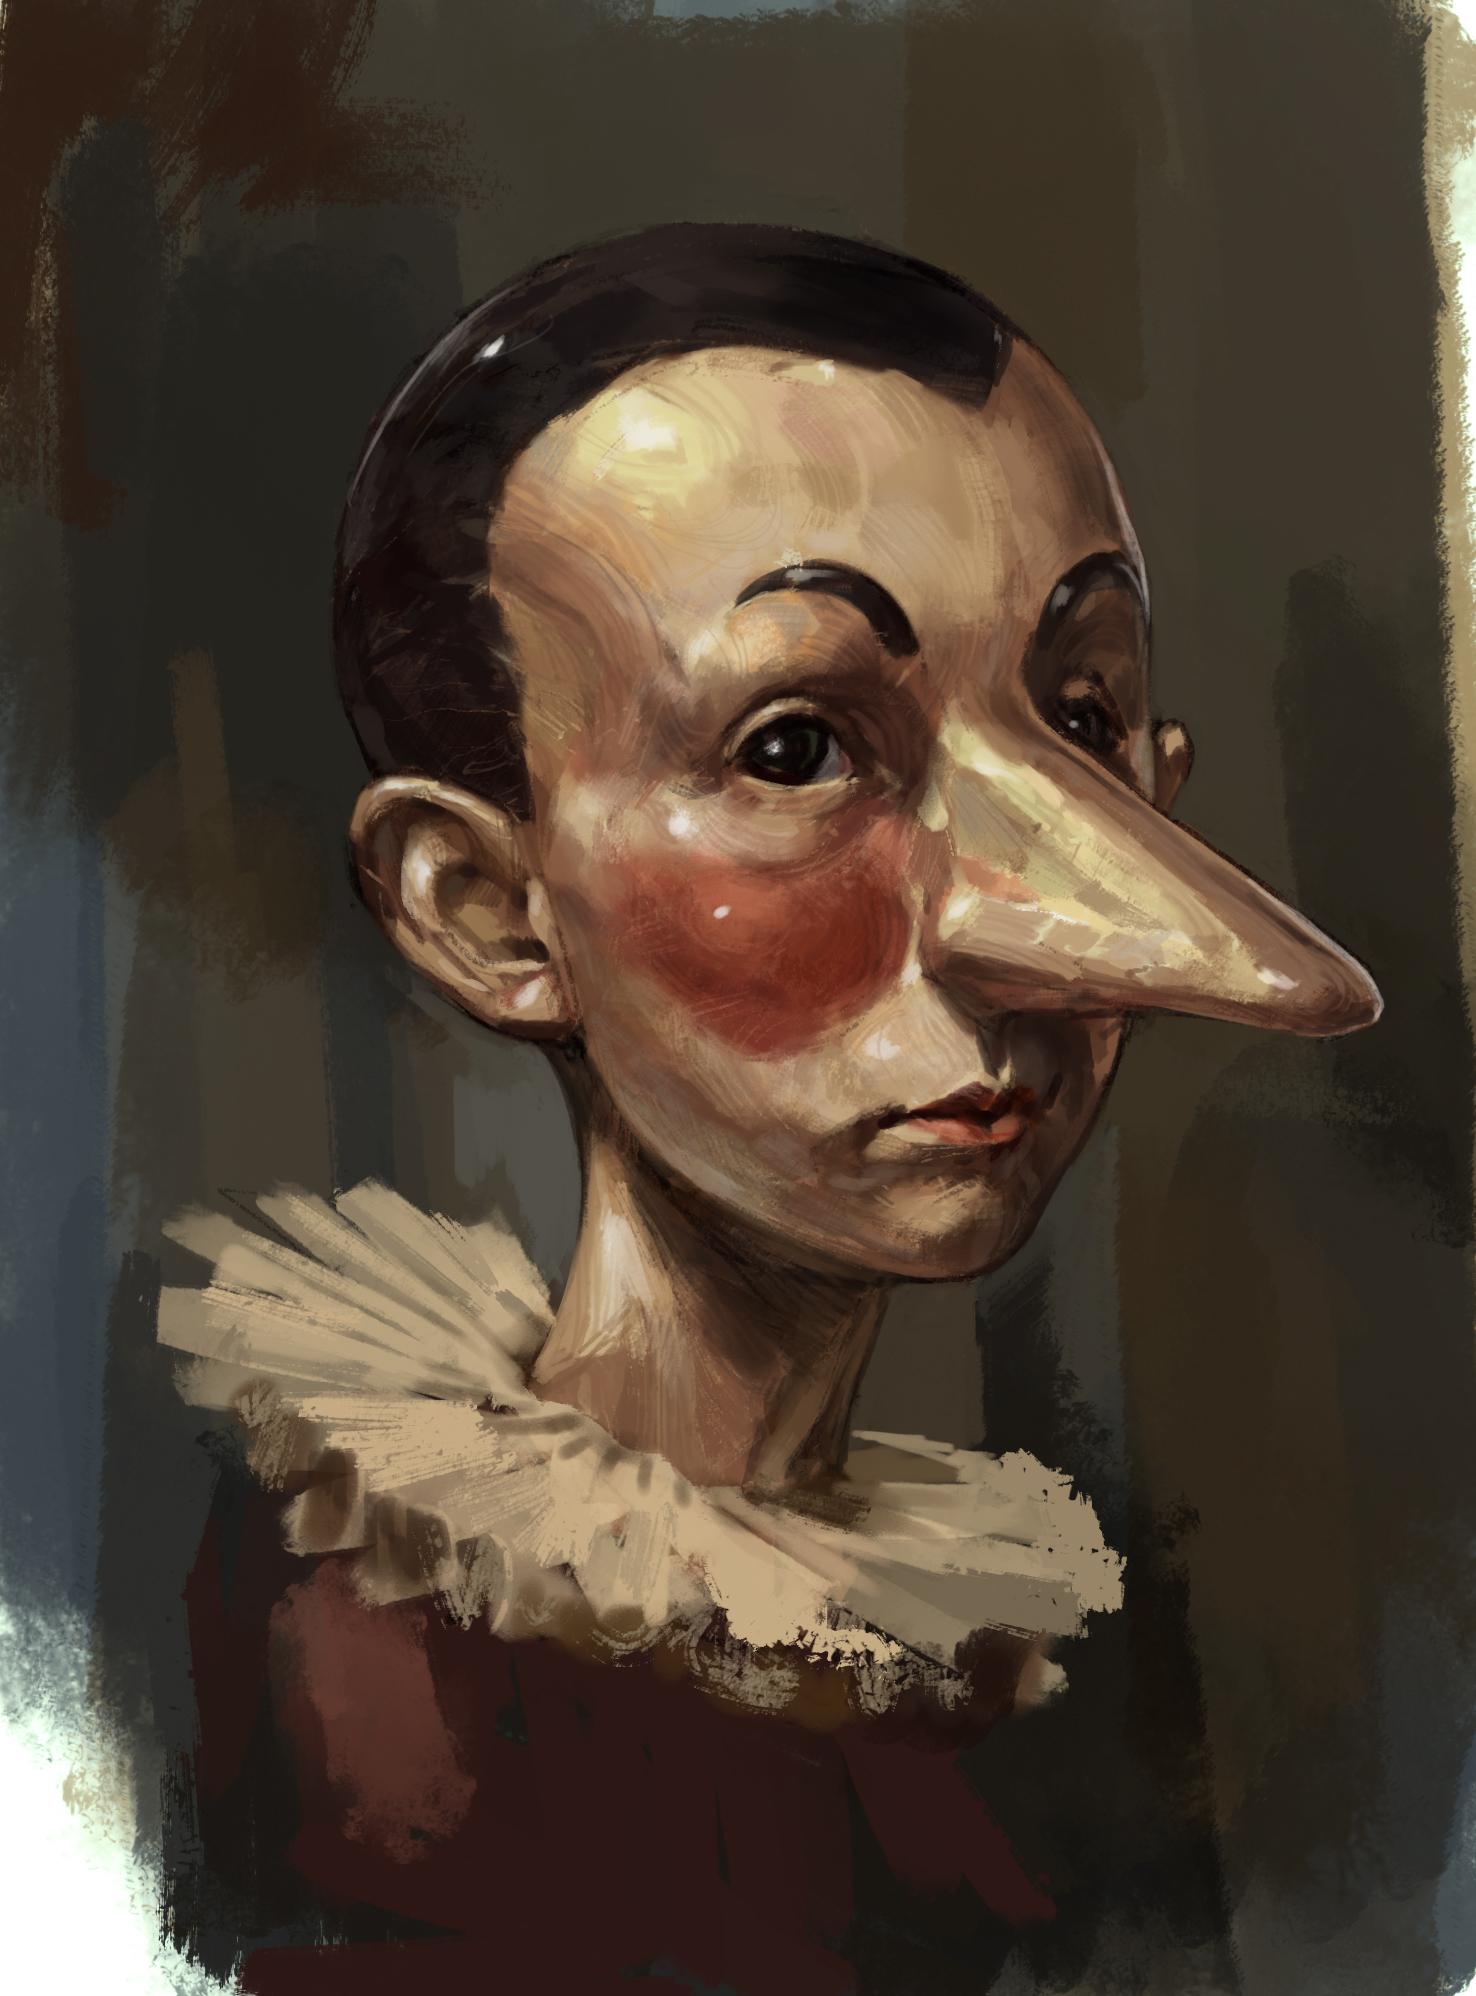 RPC_Pinocchio_1.jpg